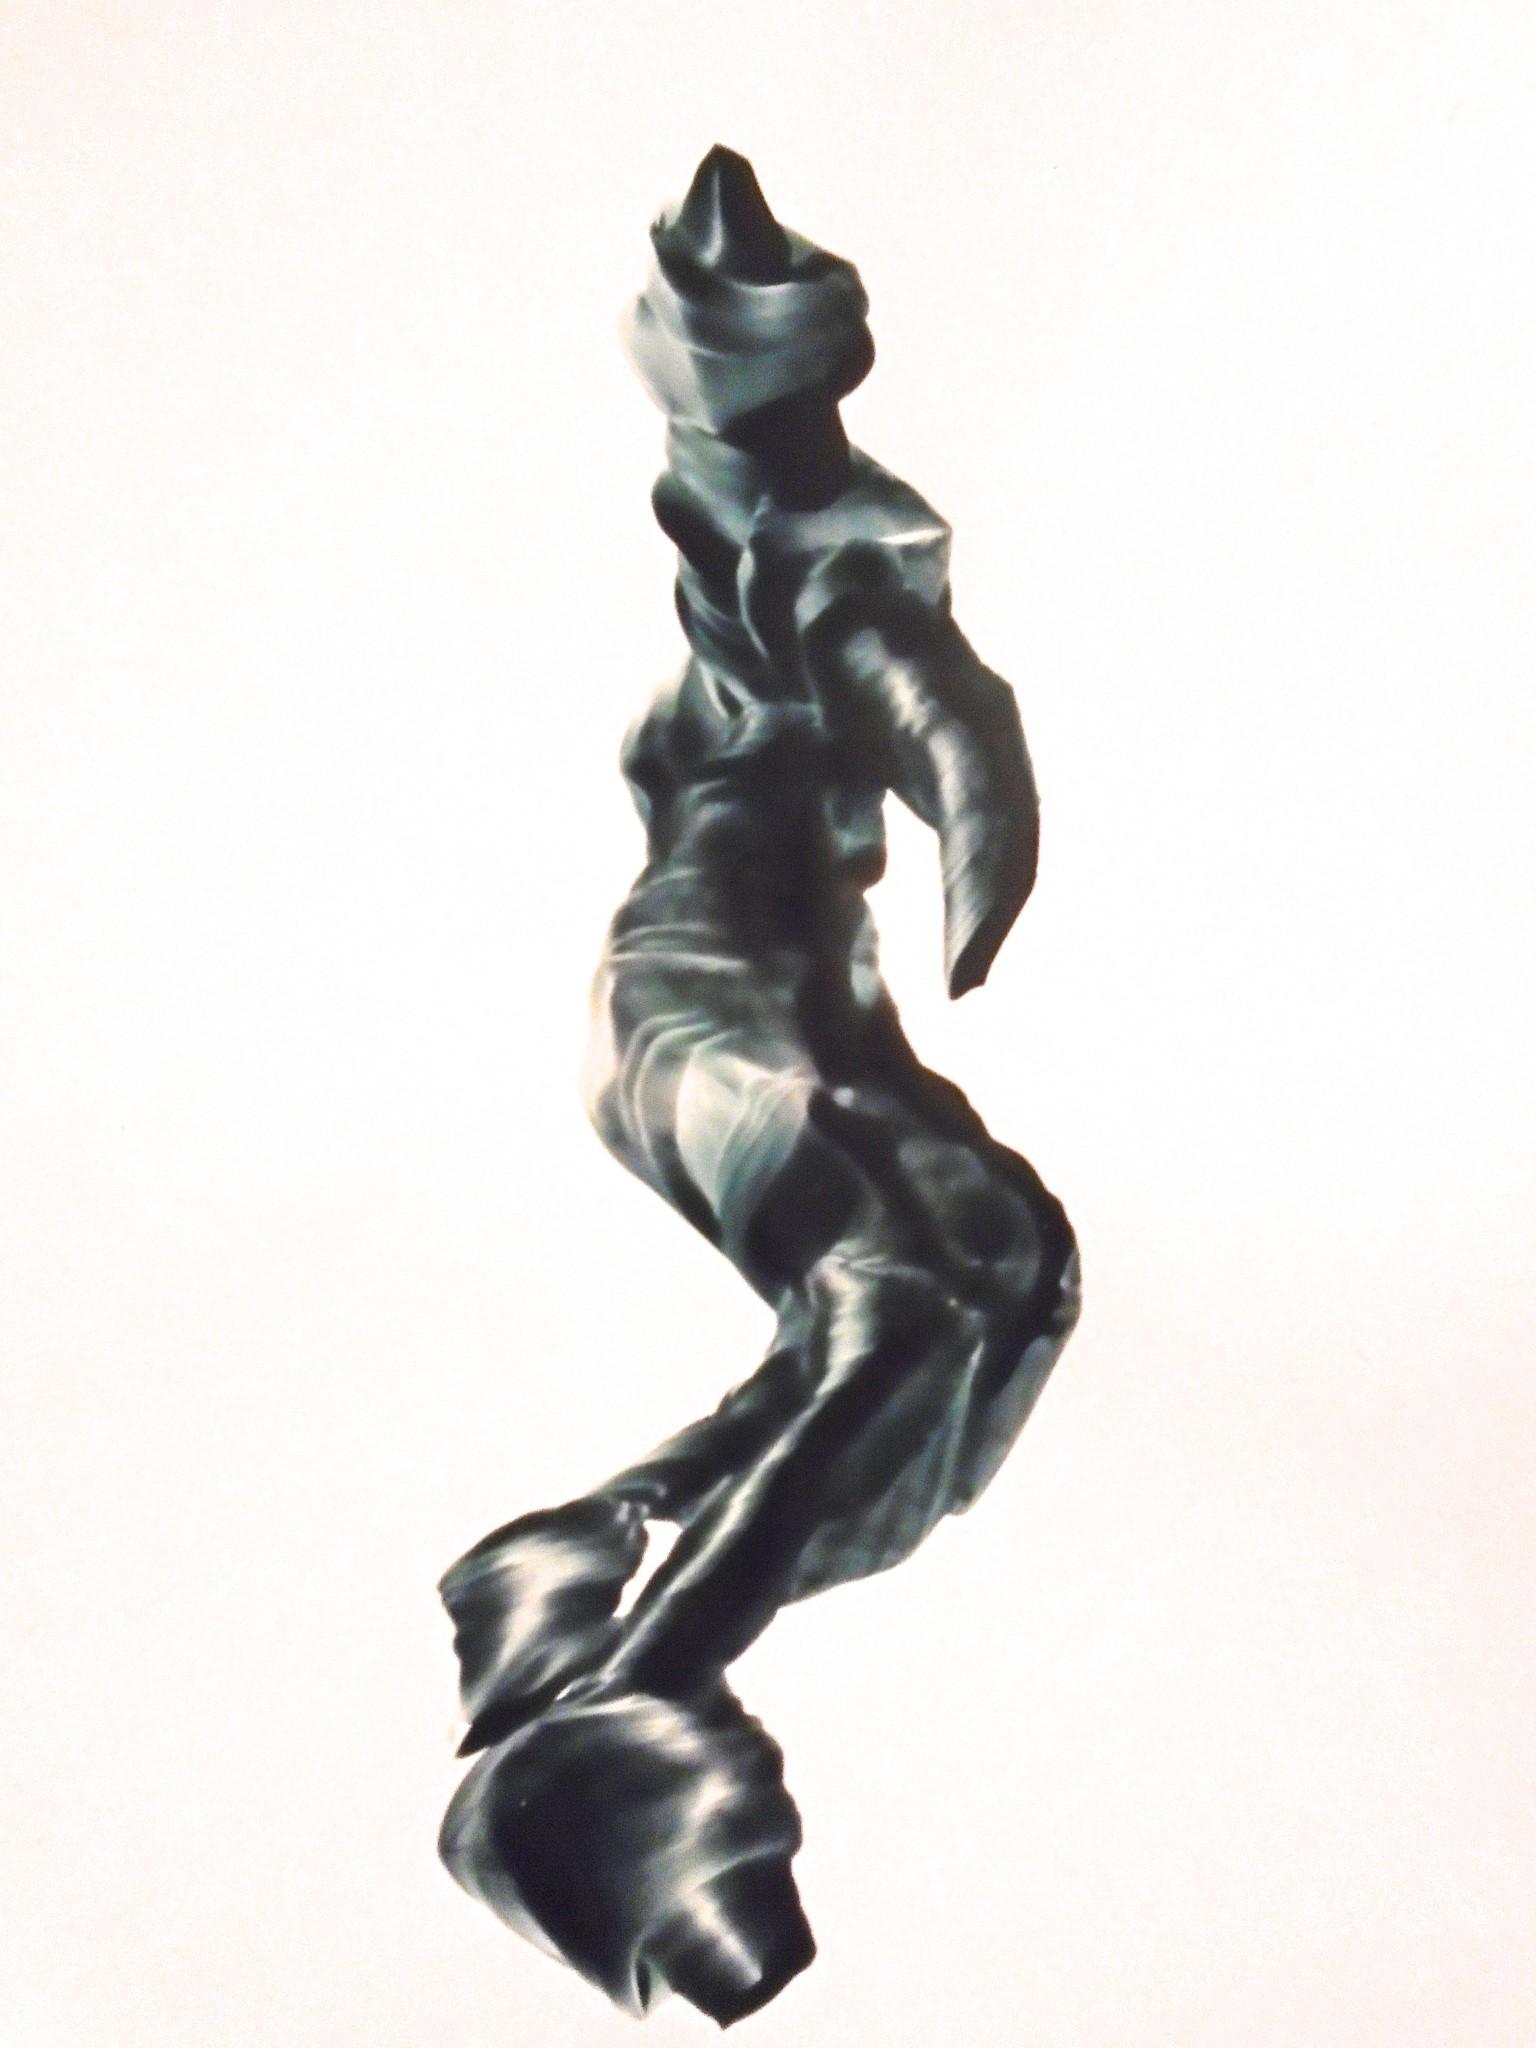 Untitled von Savvas Mavidis